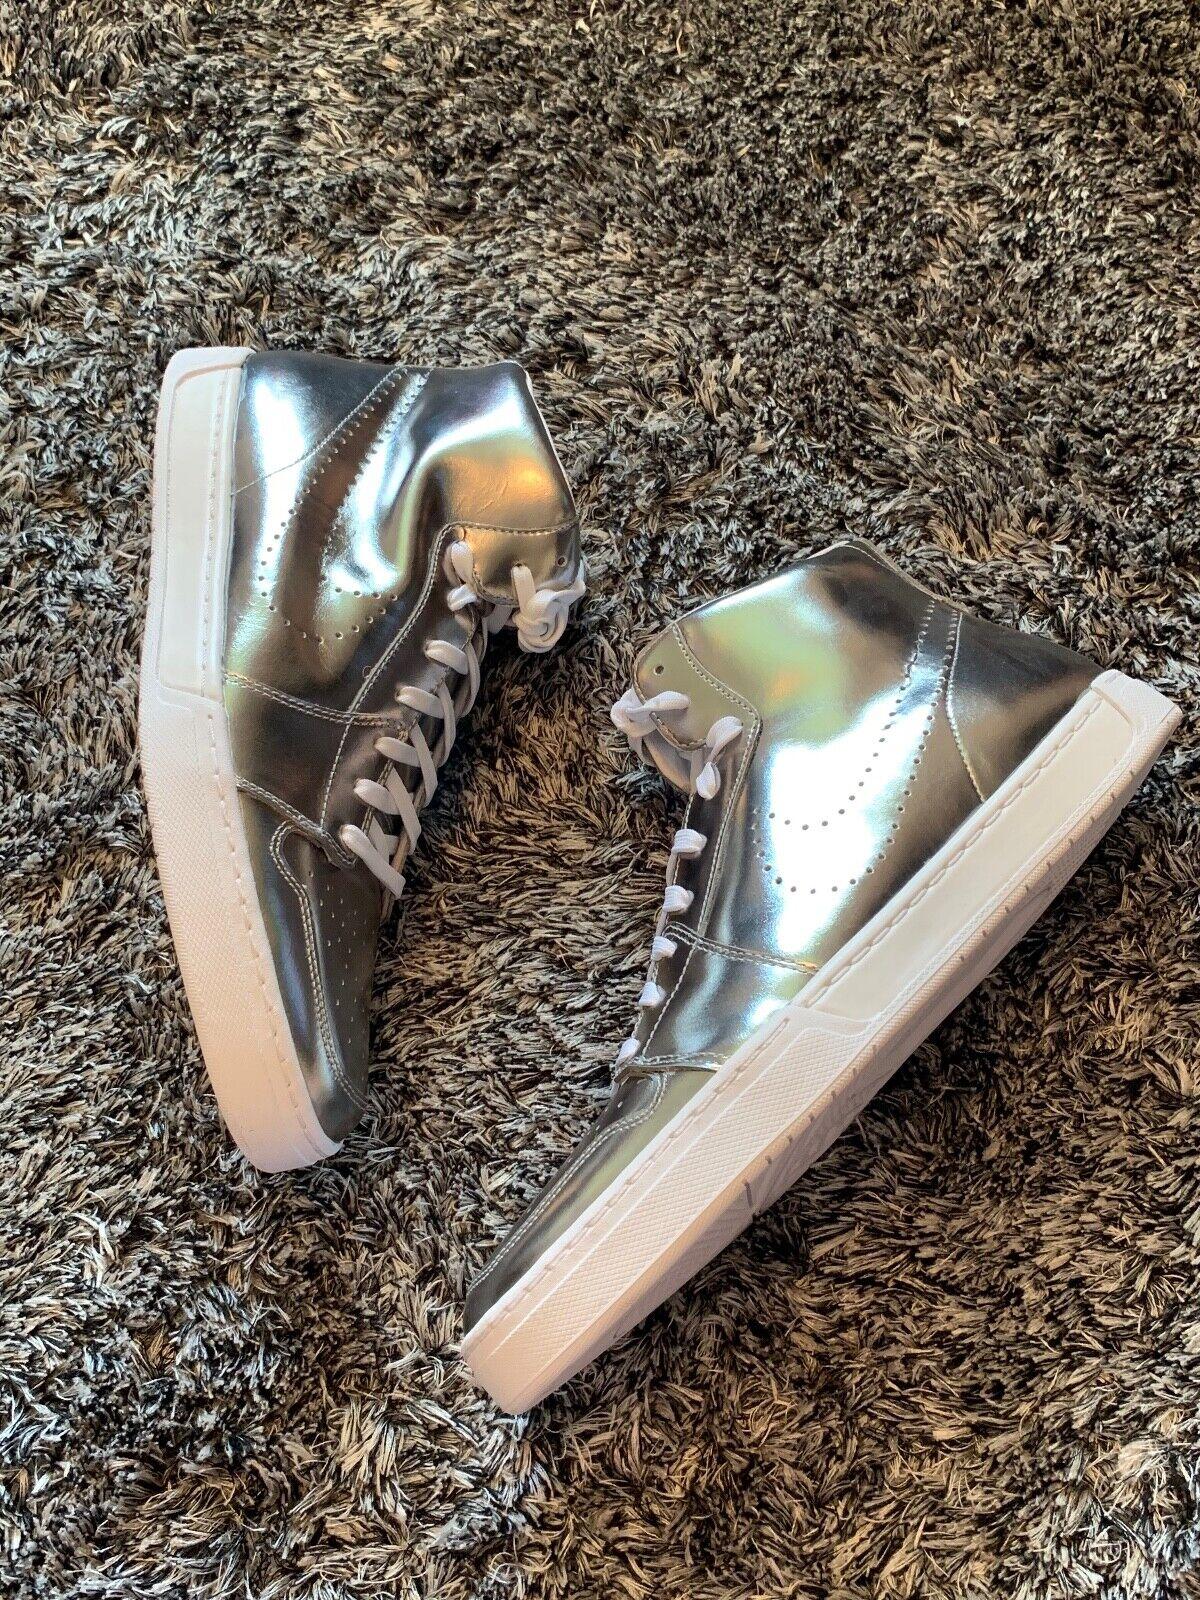 NUOVO SENZA SCATOLA-Nike argentooo scarpe da da da ginnastica Alte-Uk 12 47 ab555c